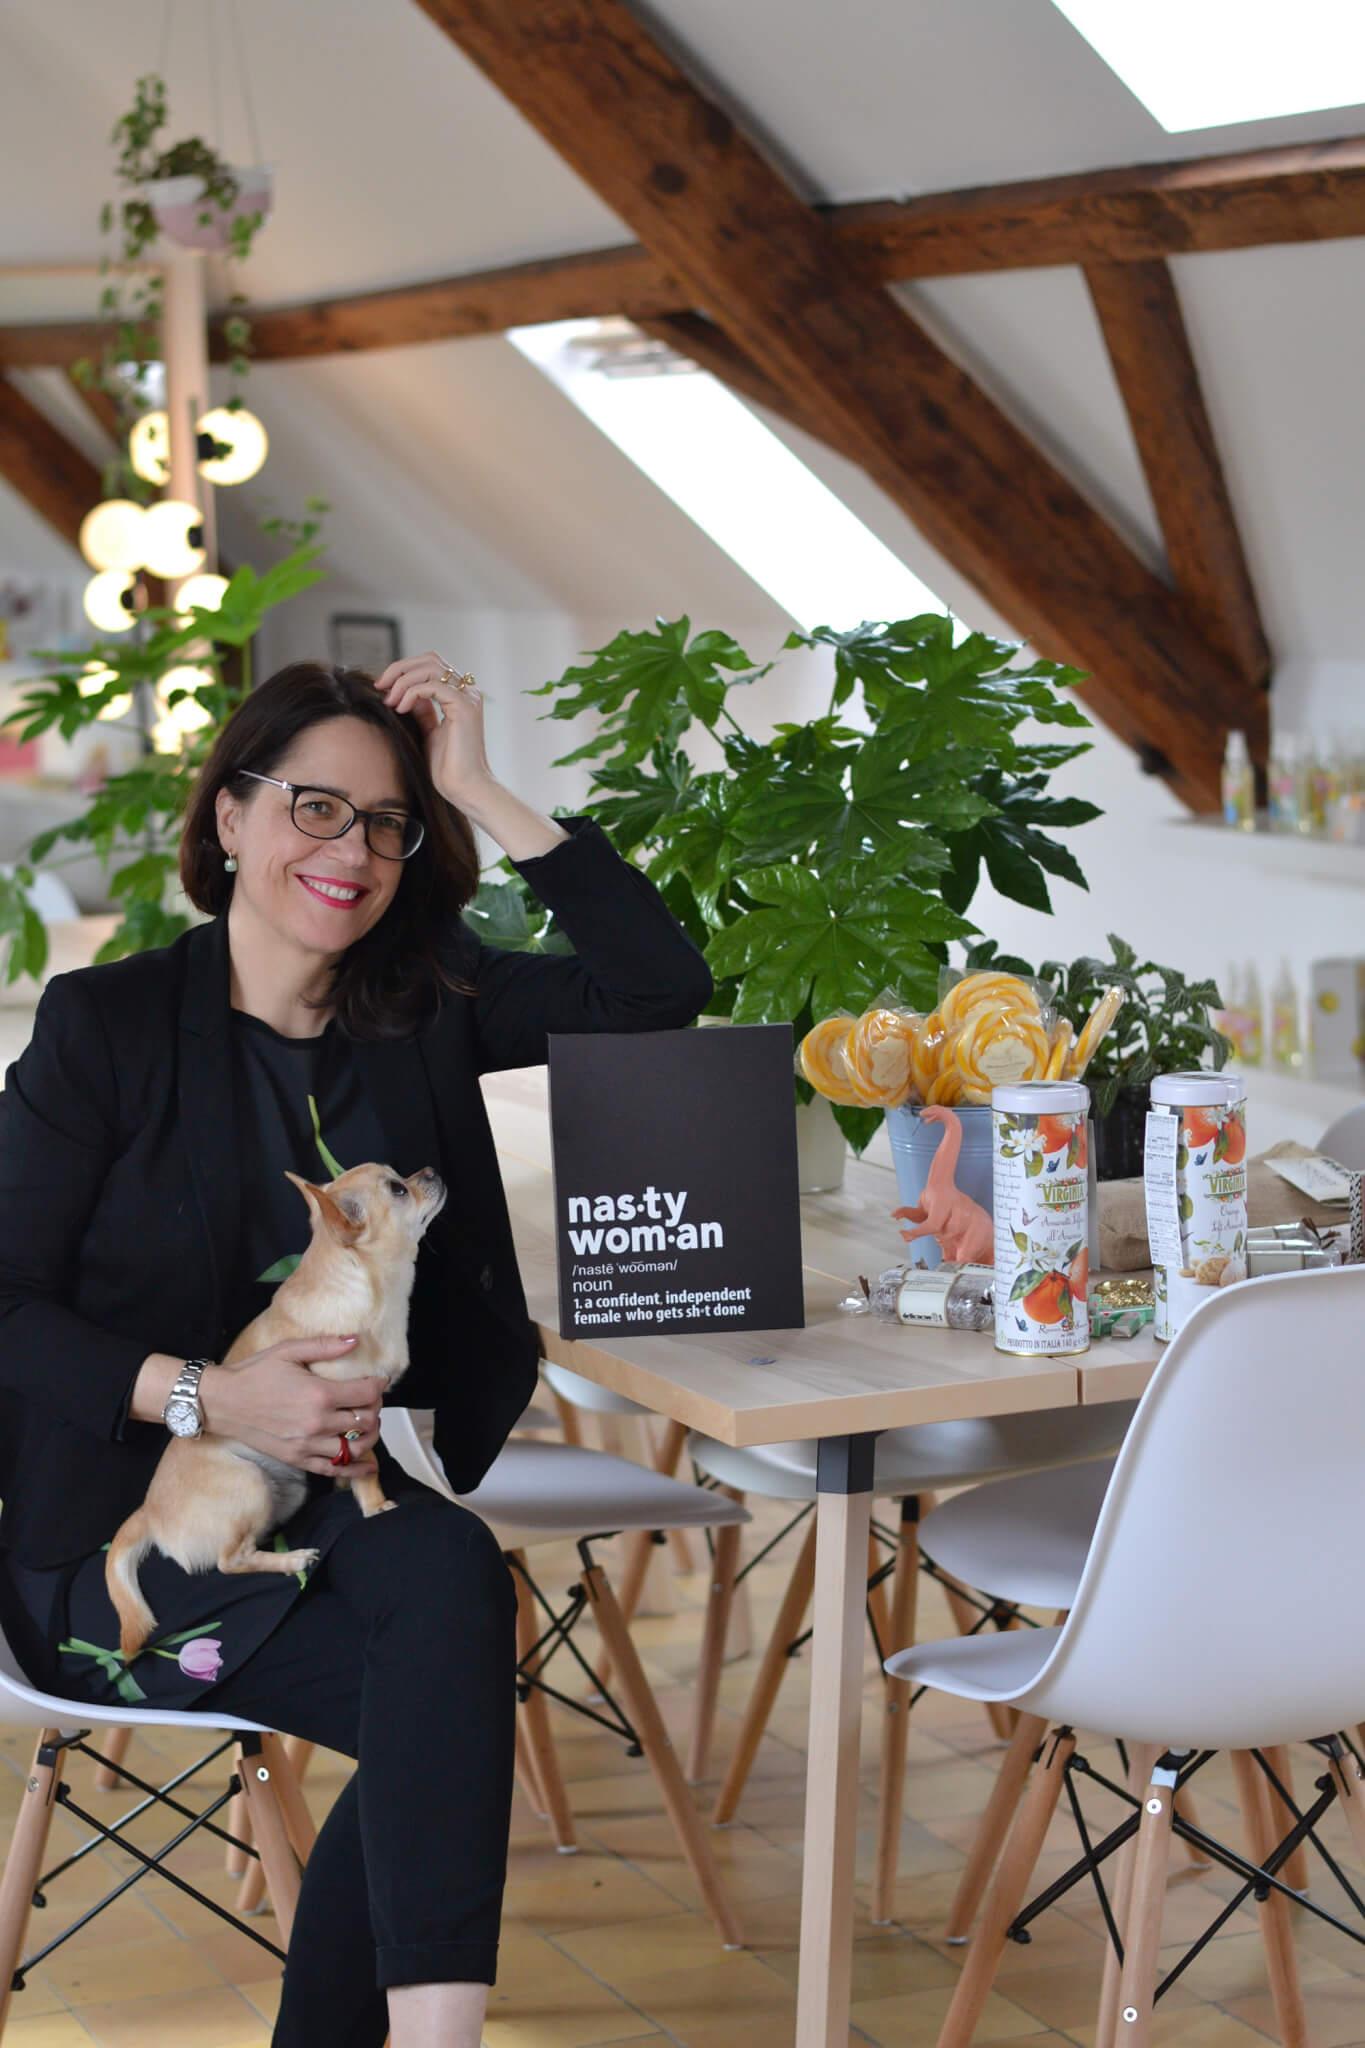 La Donna Cannone Berlin Barletta-Eis Eiscafe Isabel Cafe Hohenzollern Beatrice-Lewald-Barletta